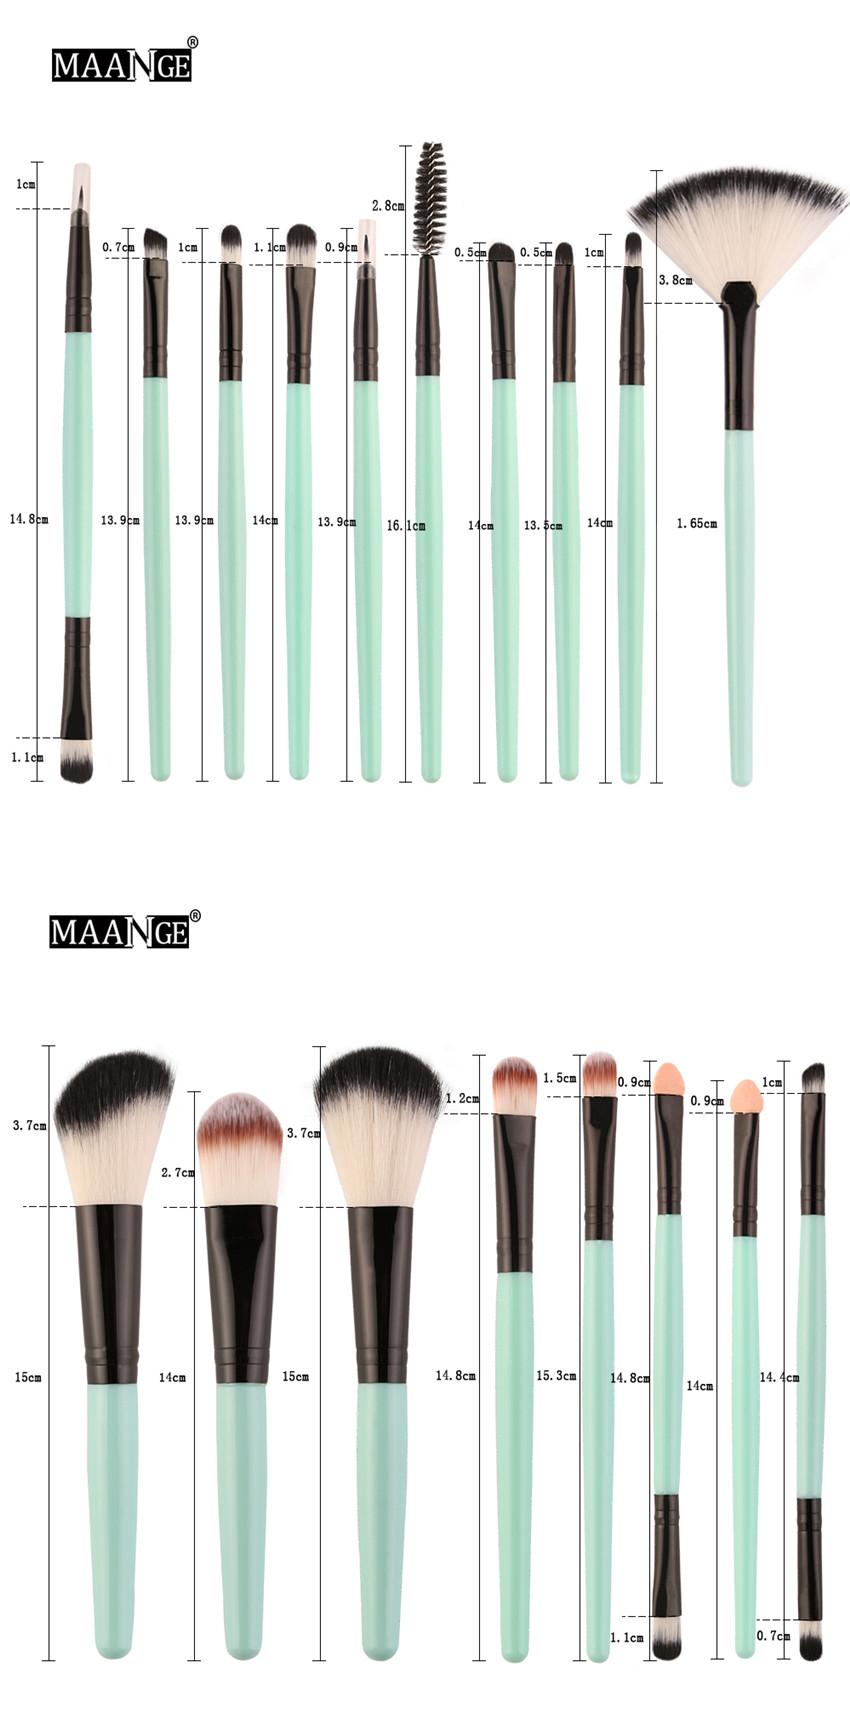 18Pcs/lot Brand Brushes Makeup Brush Set maquiagem Cosmetics Power Foundation Blush Eye Shadow Blending Fan Make Up Kits Beauty 14